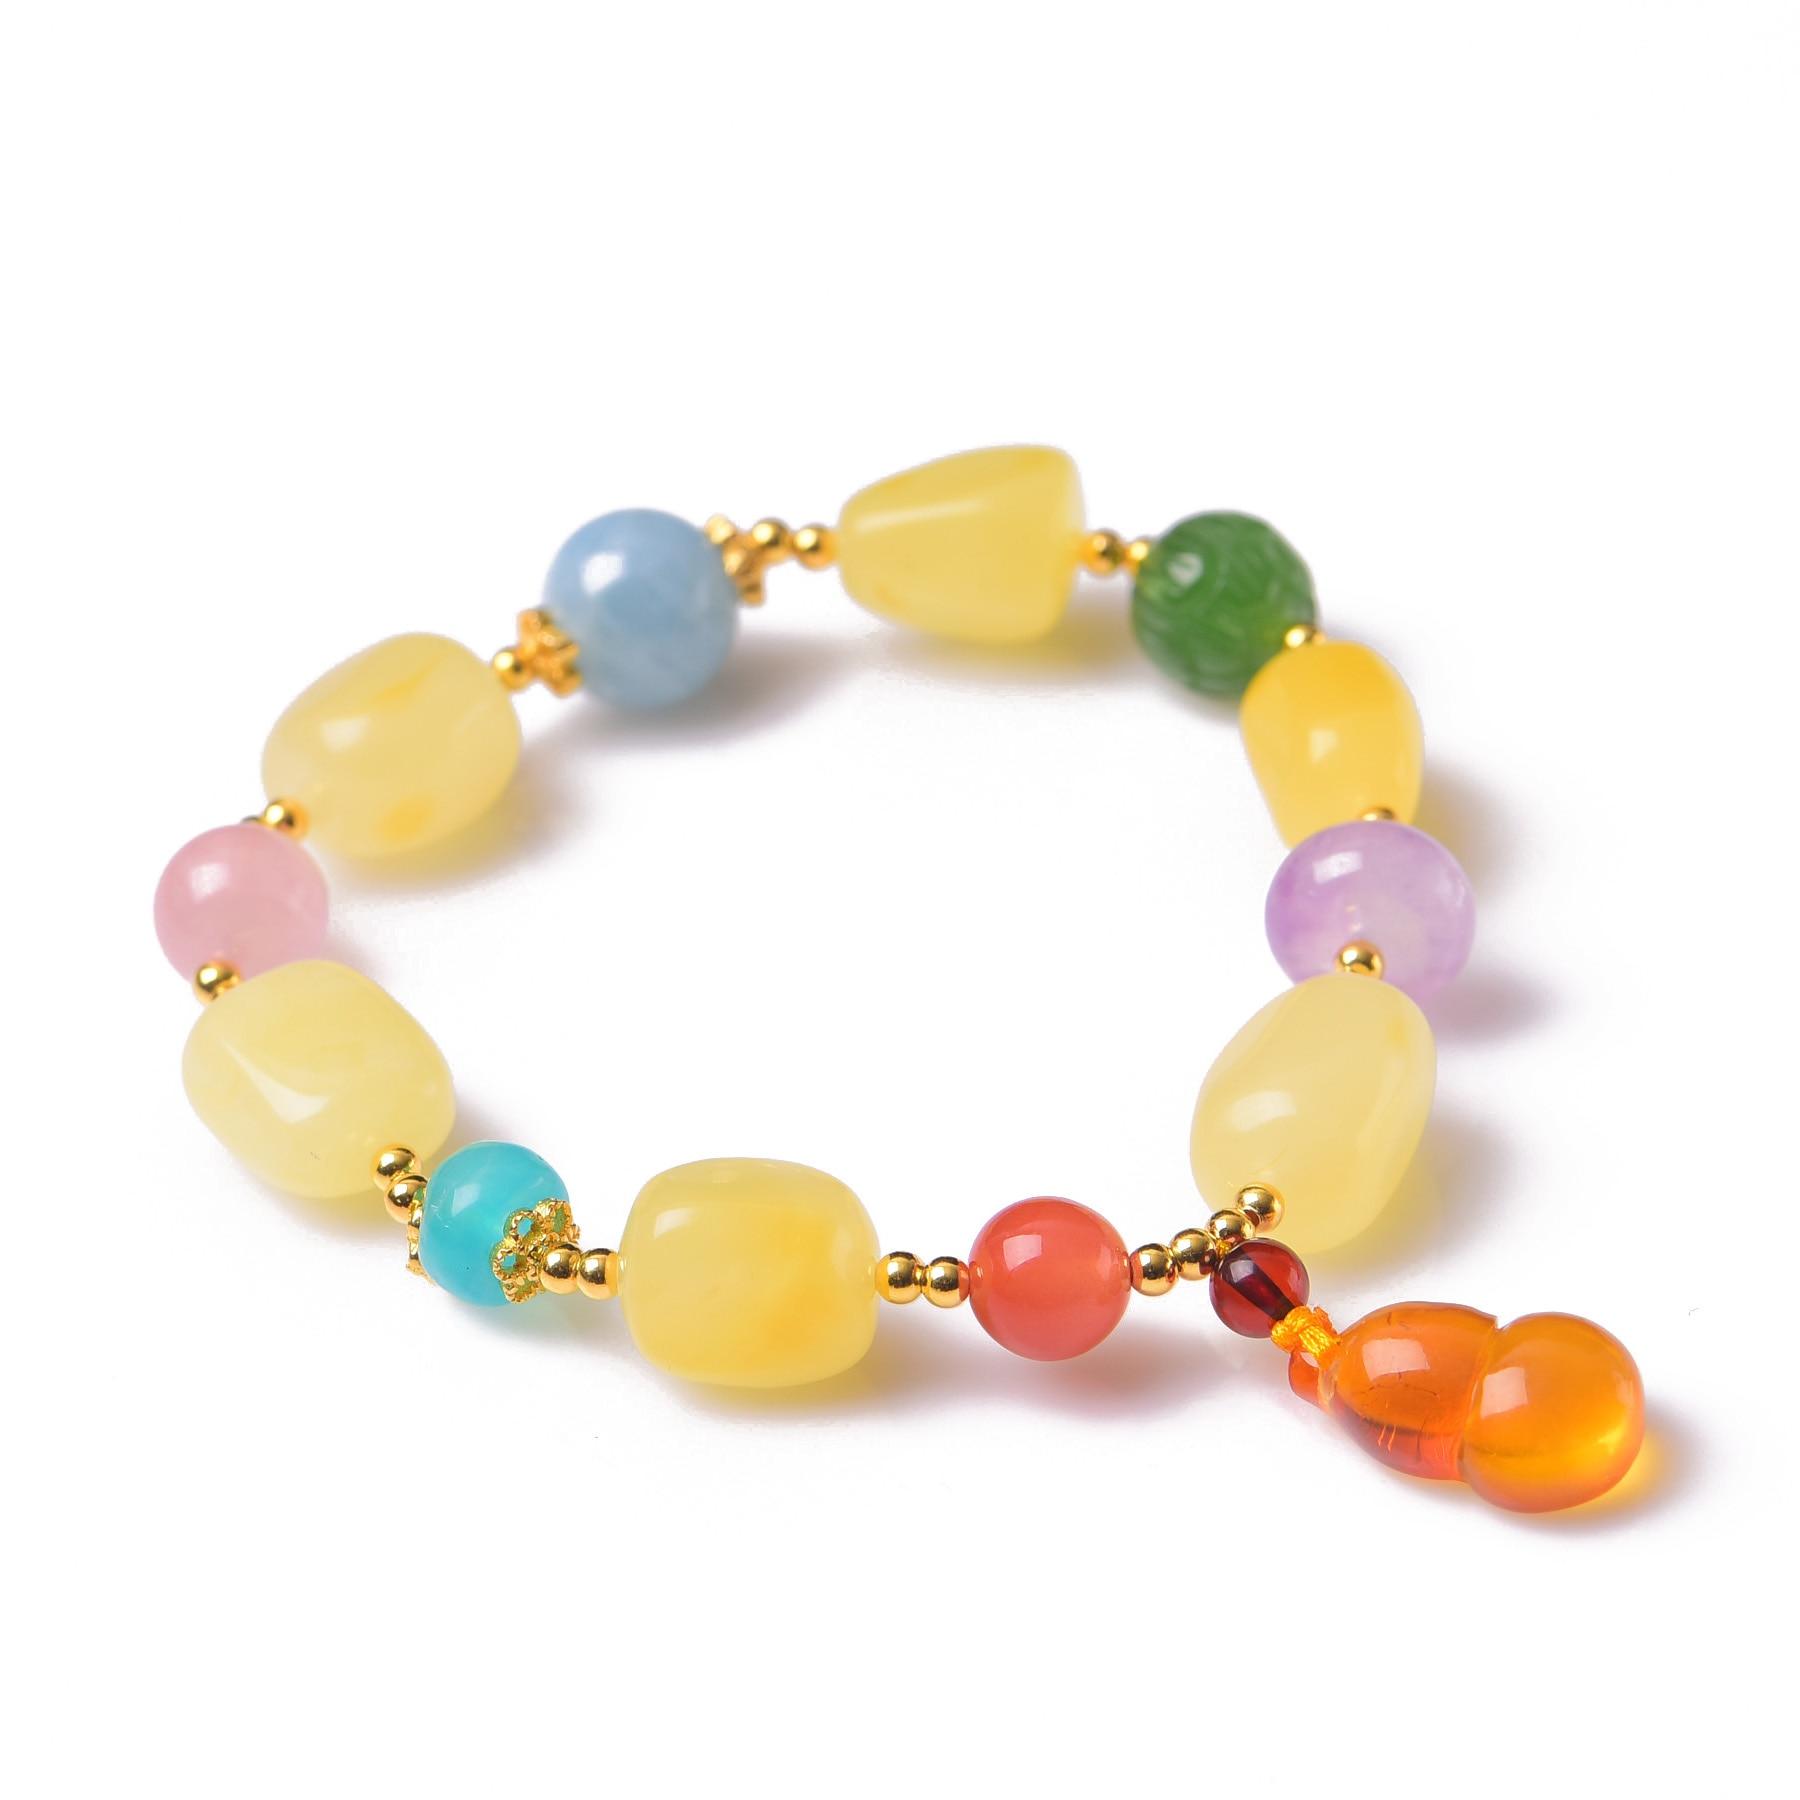 Handmade Authentic Multi-Crystal Beads Bracelets handmade authentic multi crystal bracelets